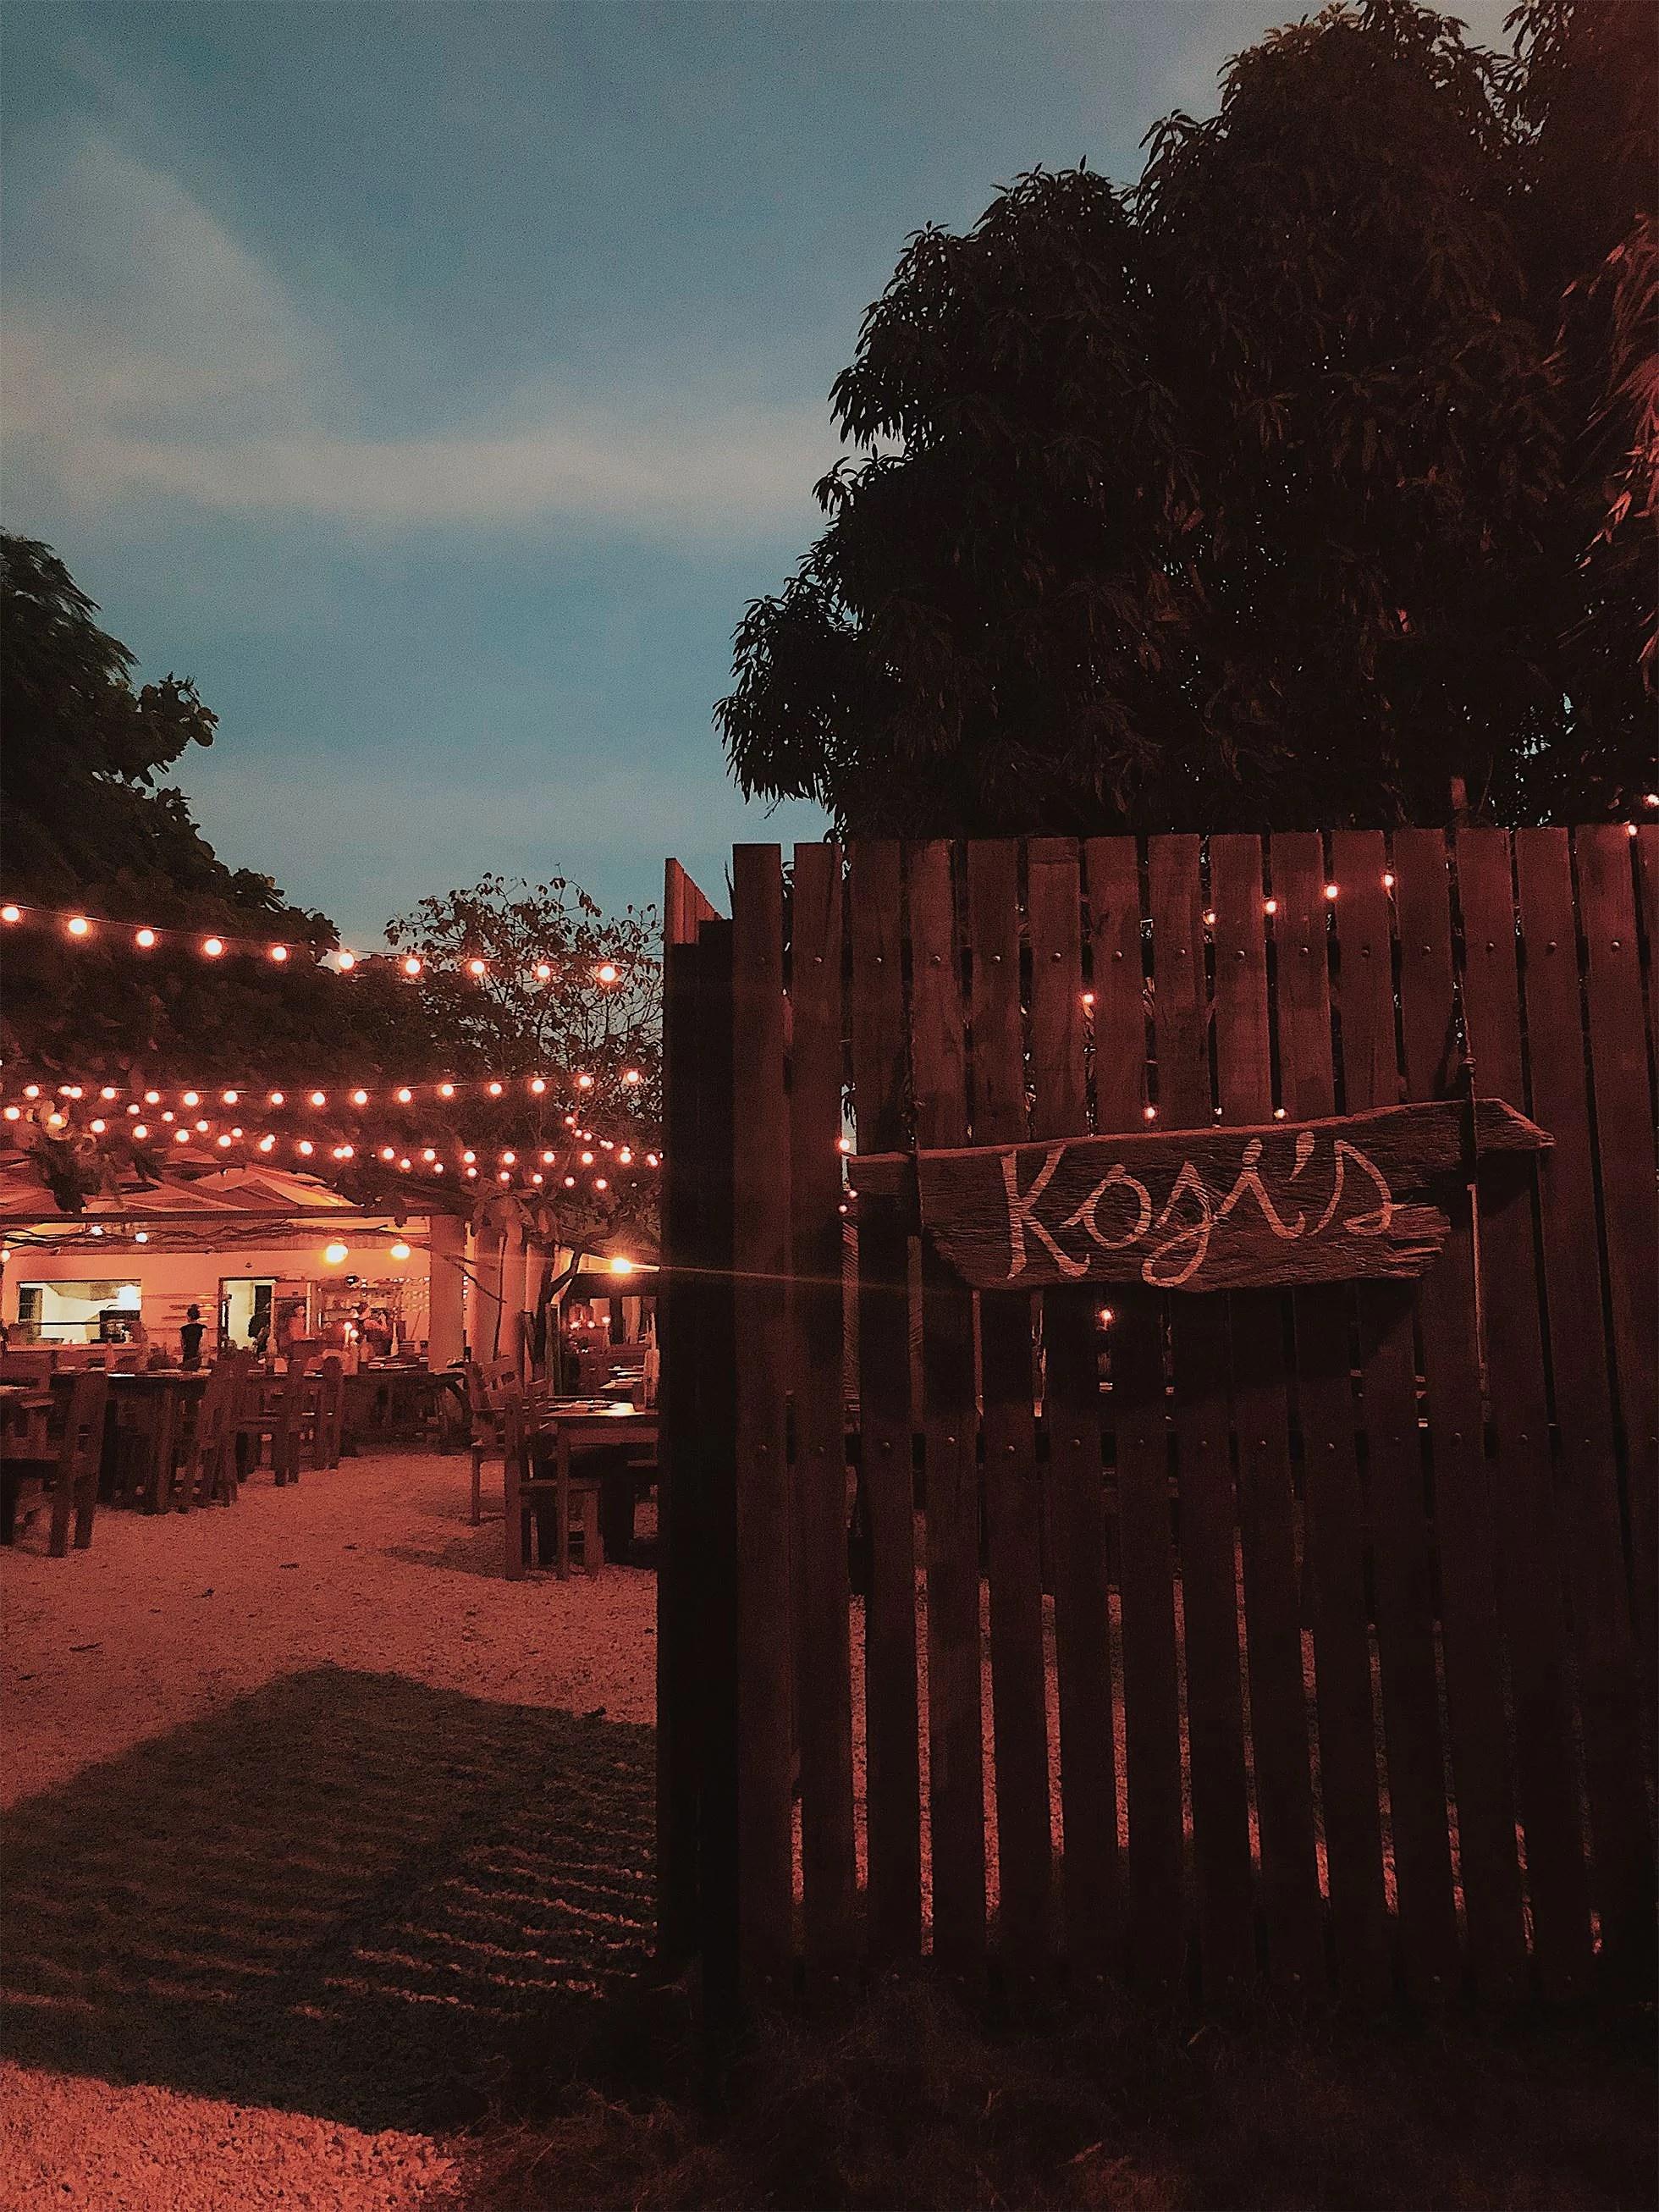 W - DINNER AT KOJI'S